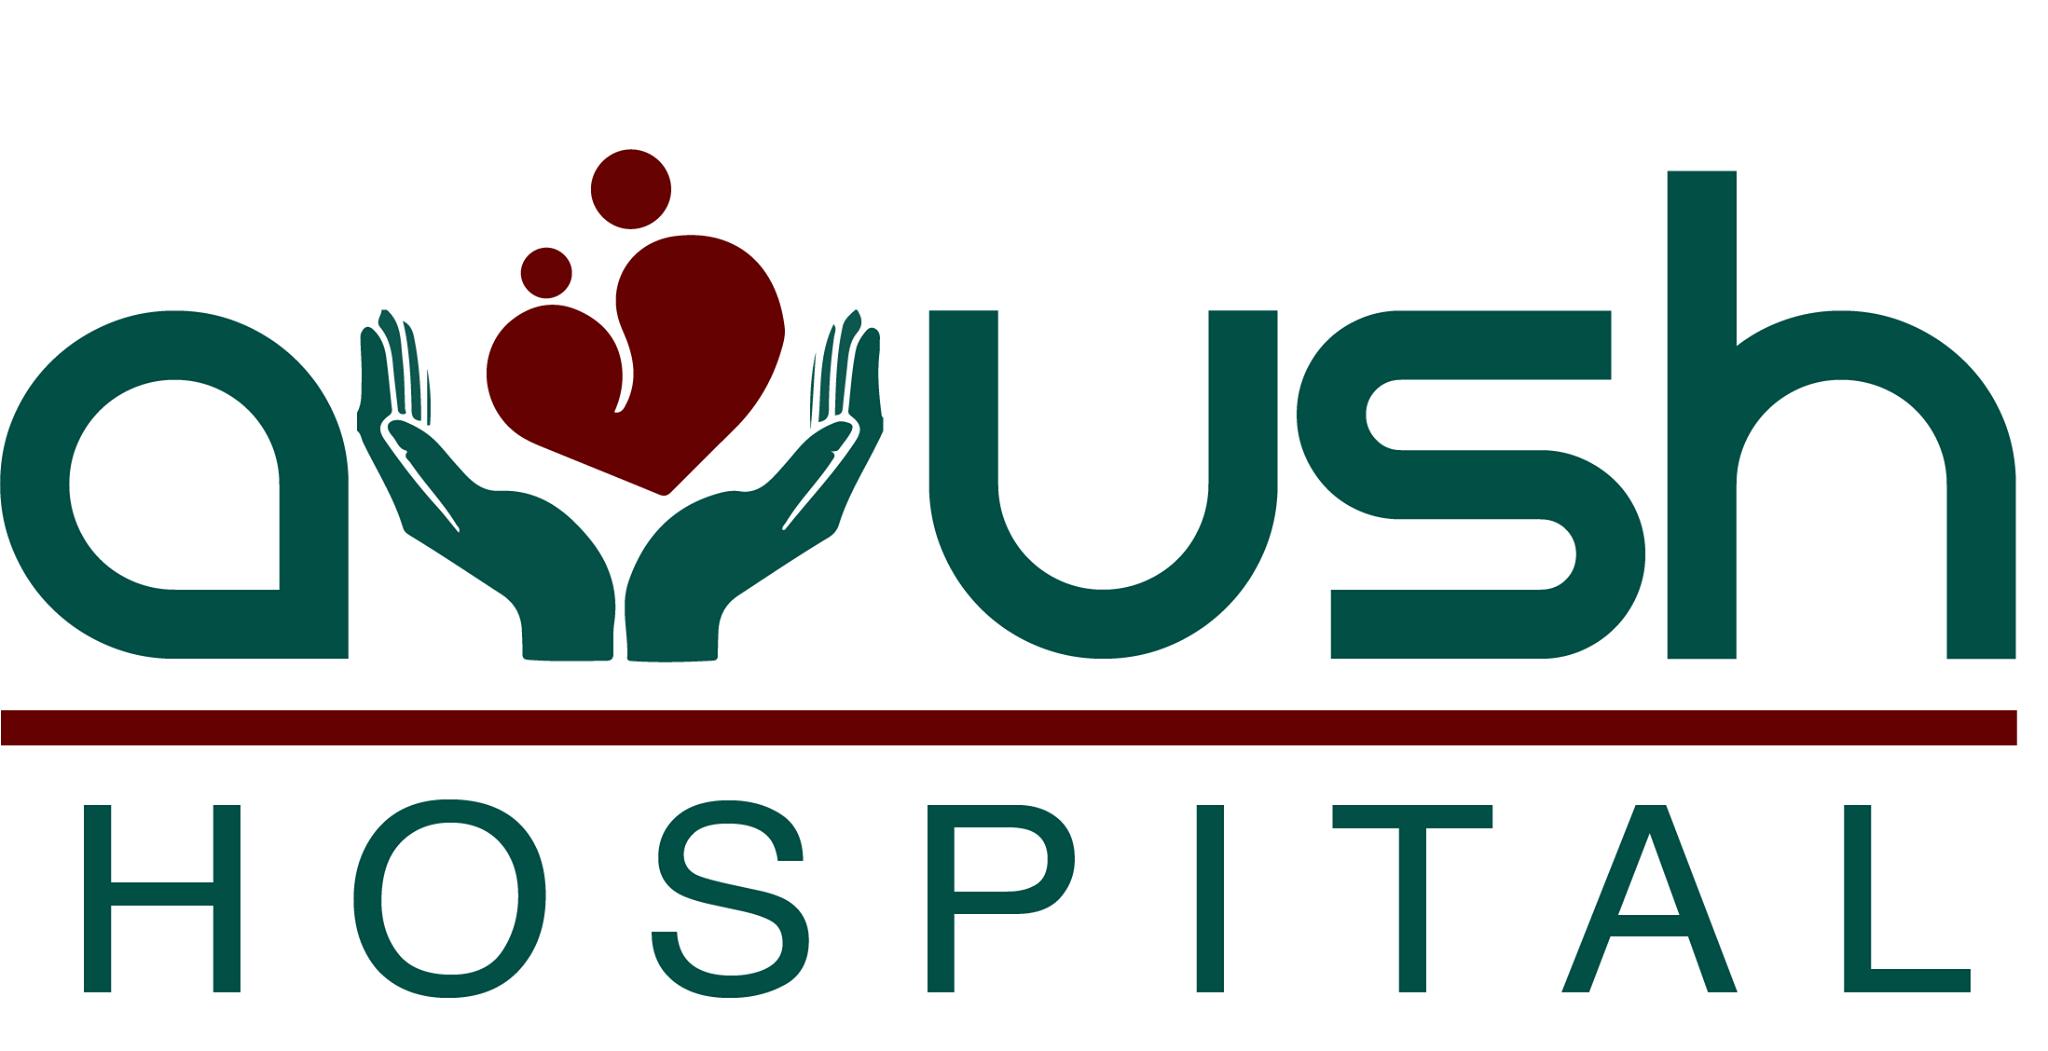 Ayush Hospital and Research Centre - Dehradun Image